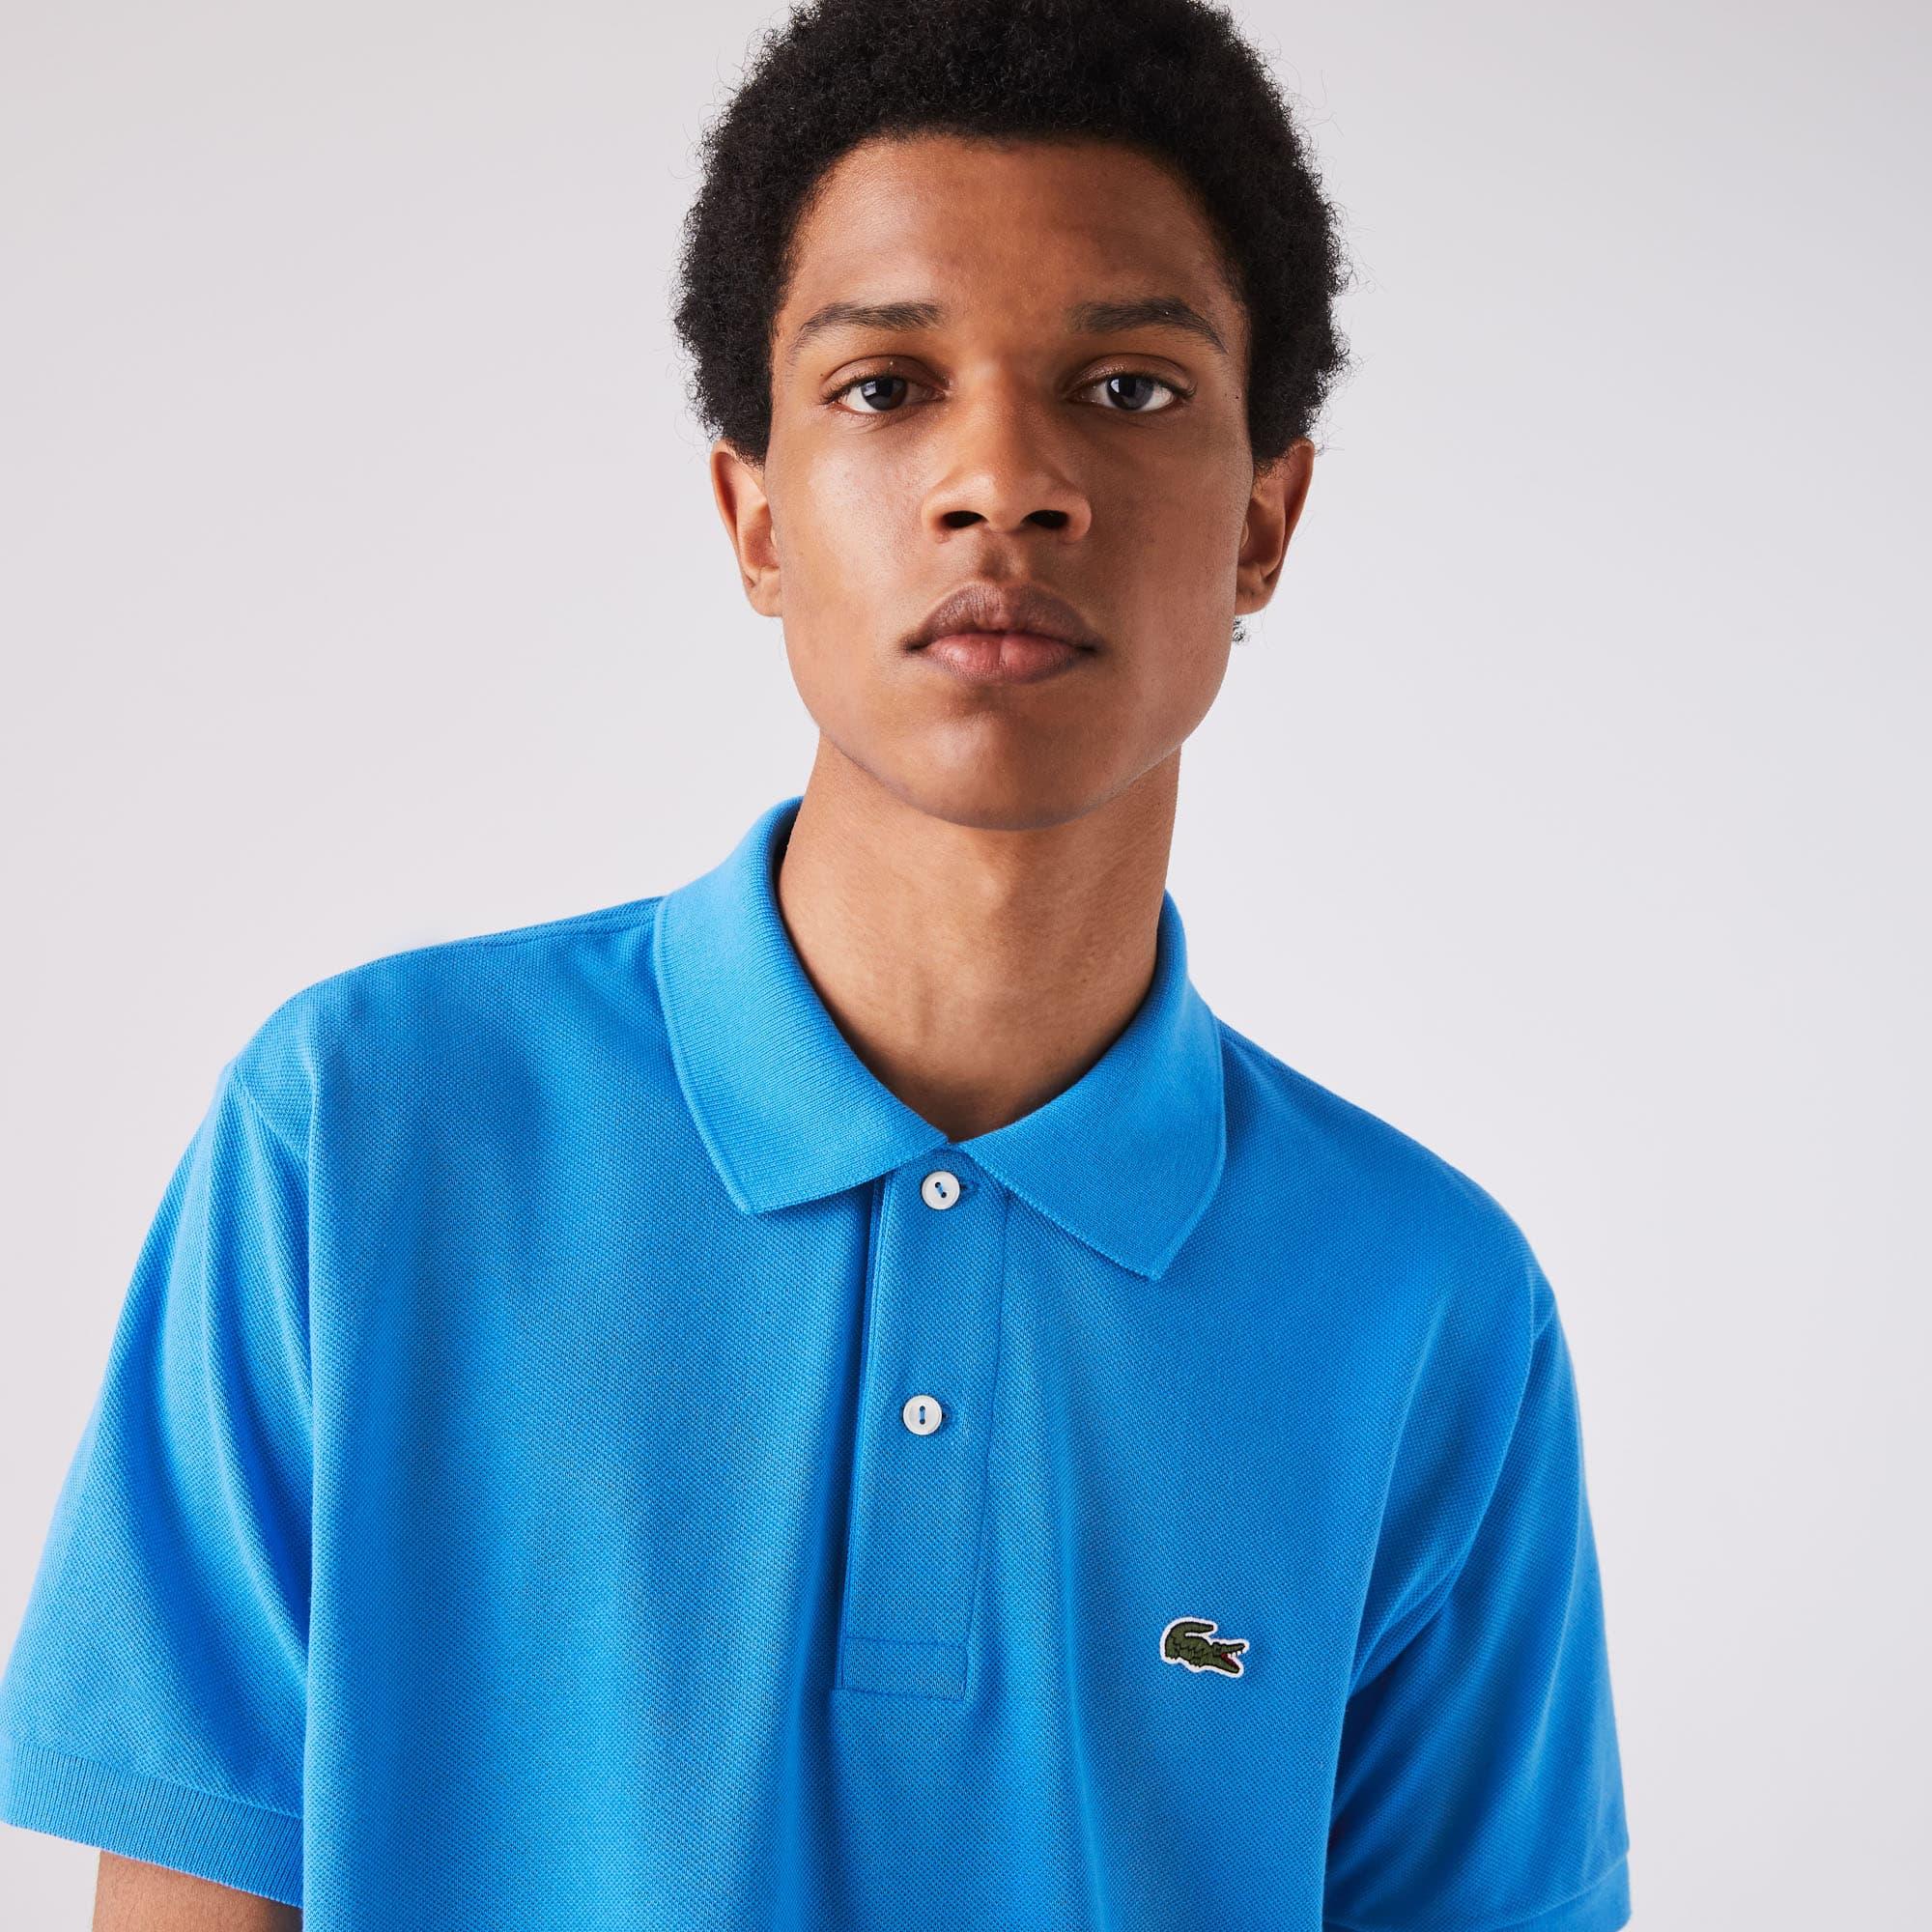 69965a5c3204 Lacoste Classic Fit L.12.12 Polo Shirt